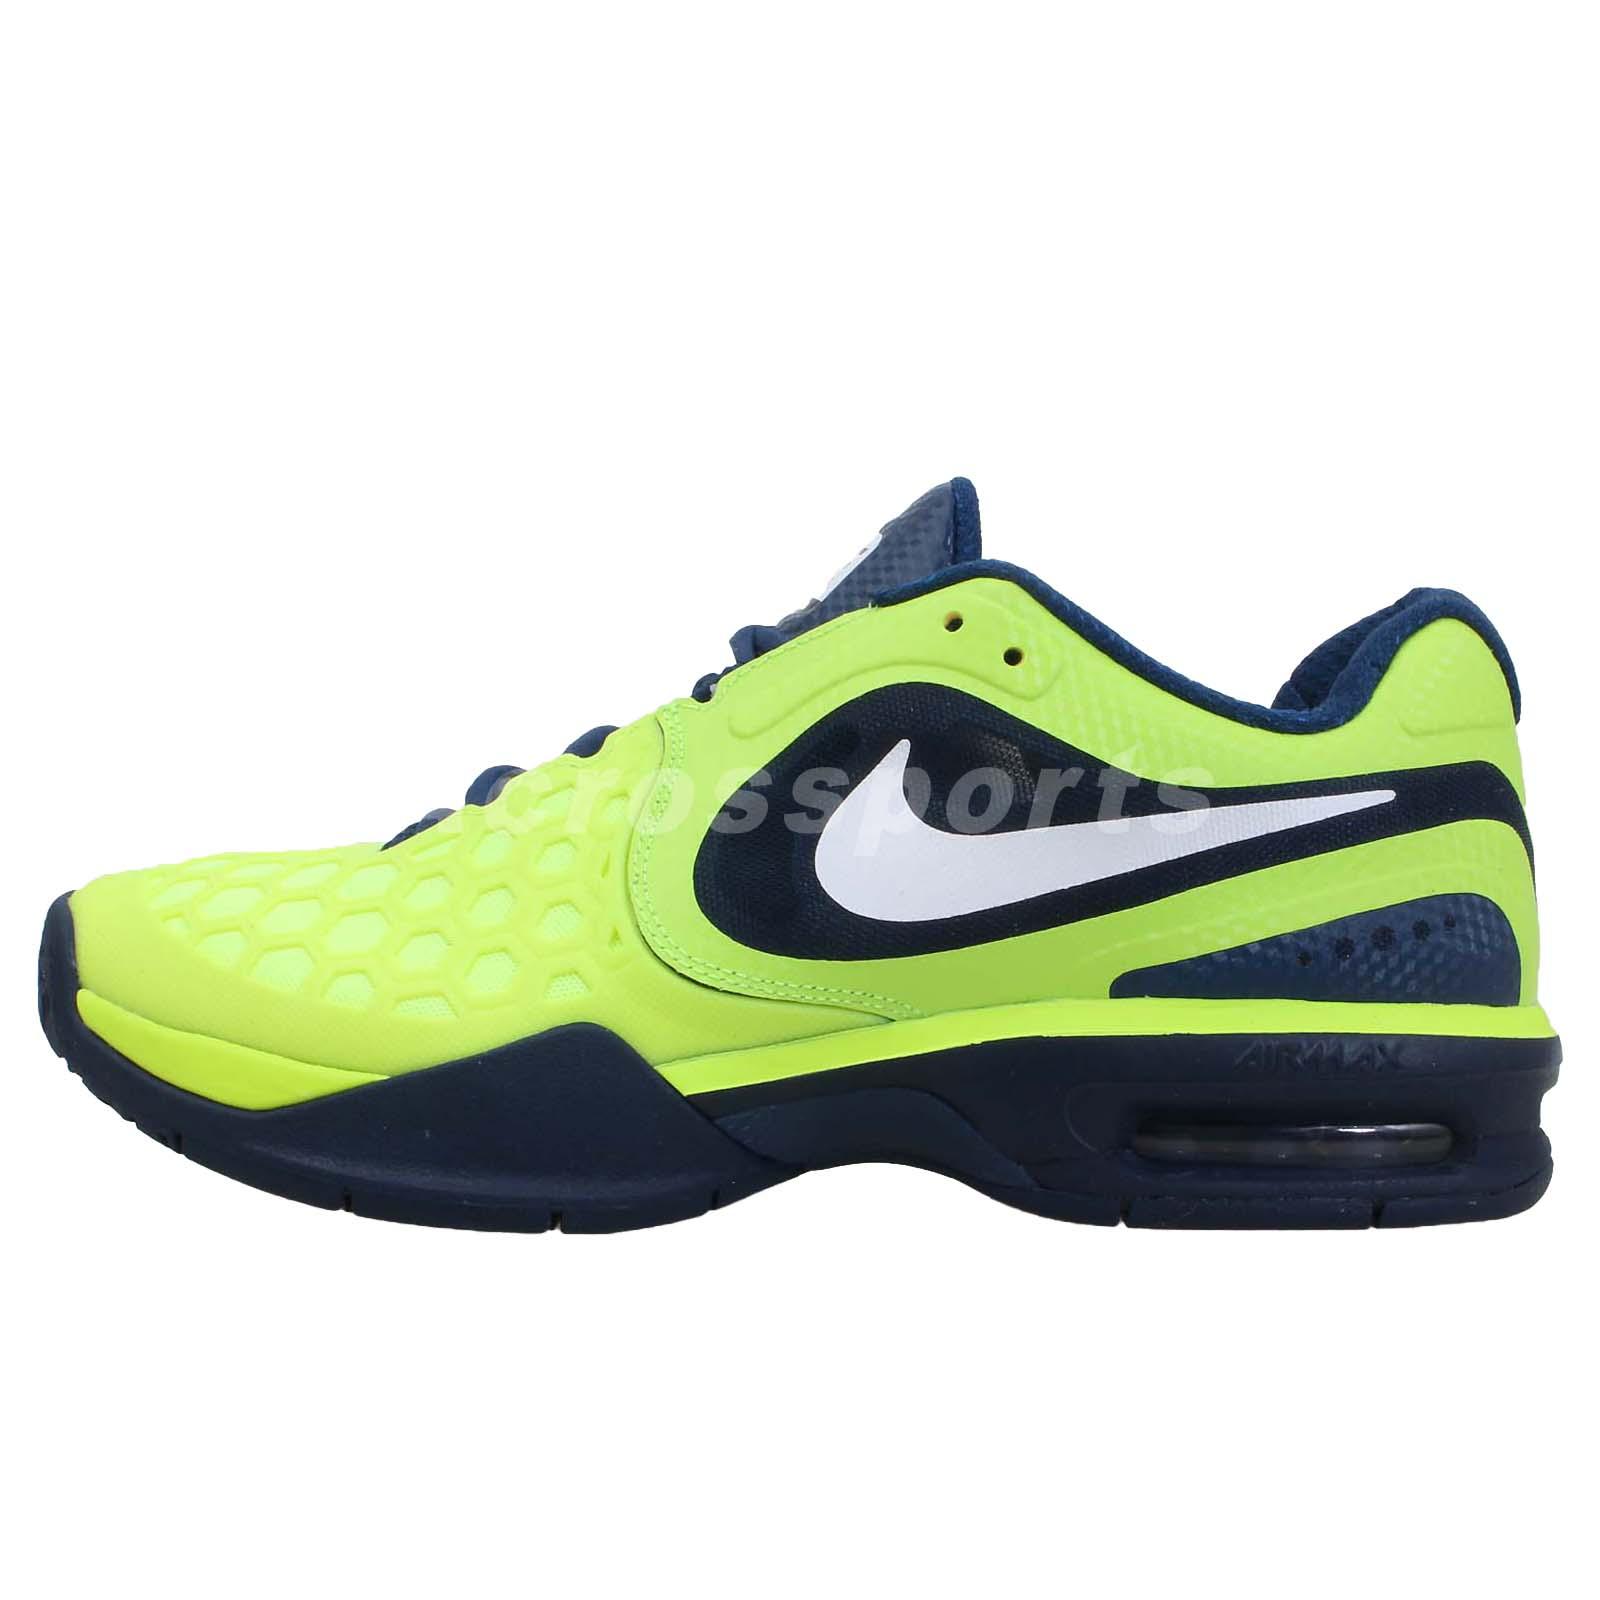 nike air max courtballistec 4 3 rafael nadal volt 2013